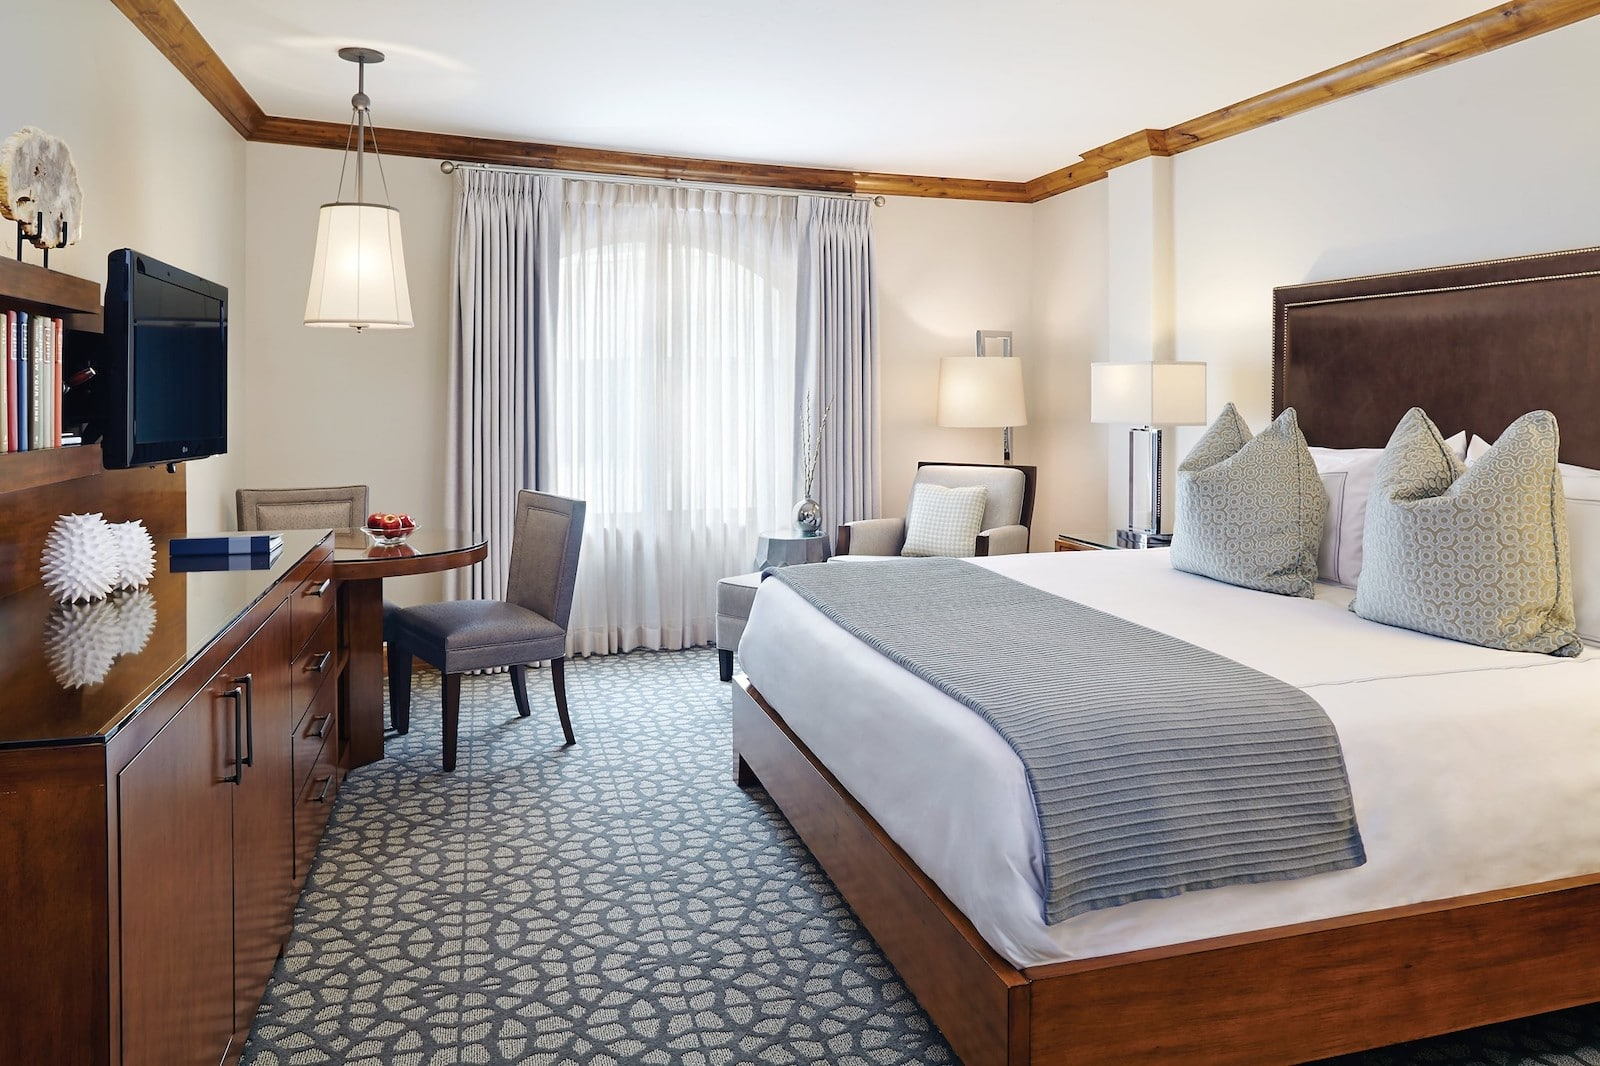 Image of a room at The Sebastian Vail in Colorado